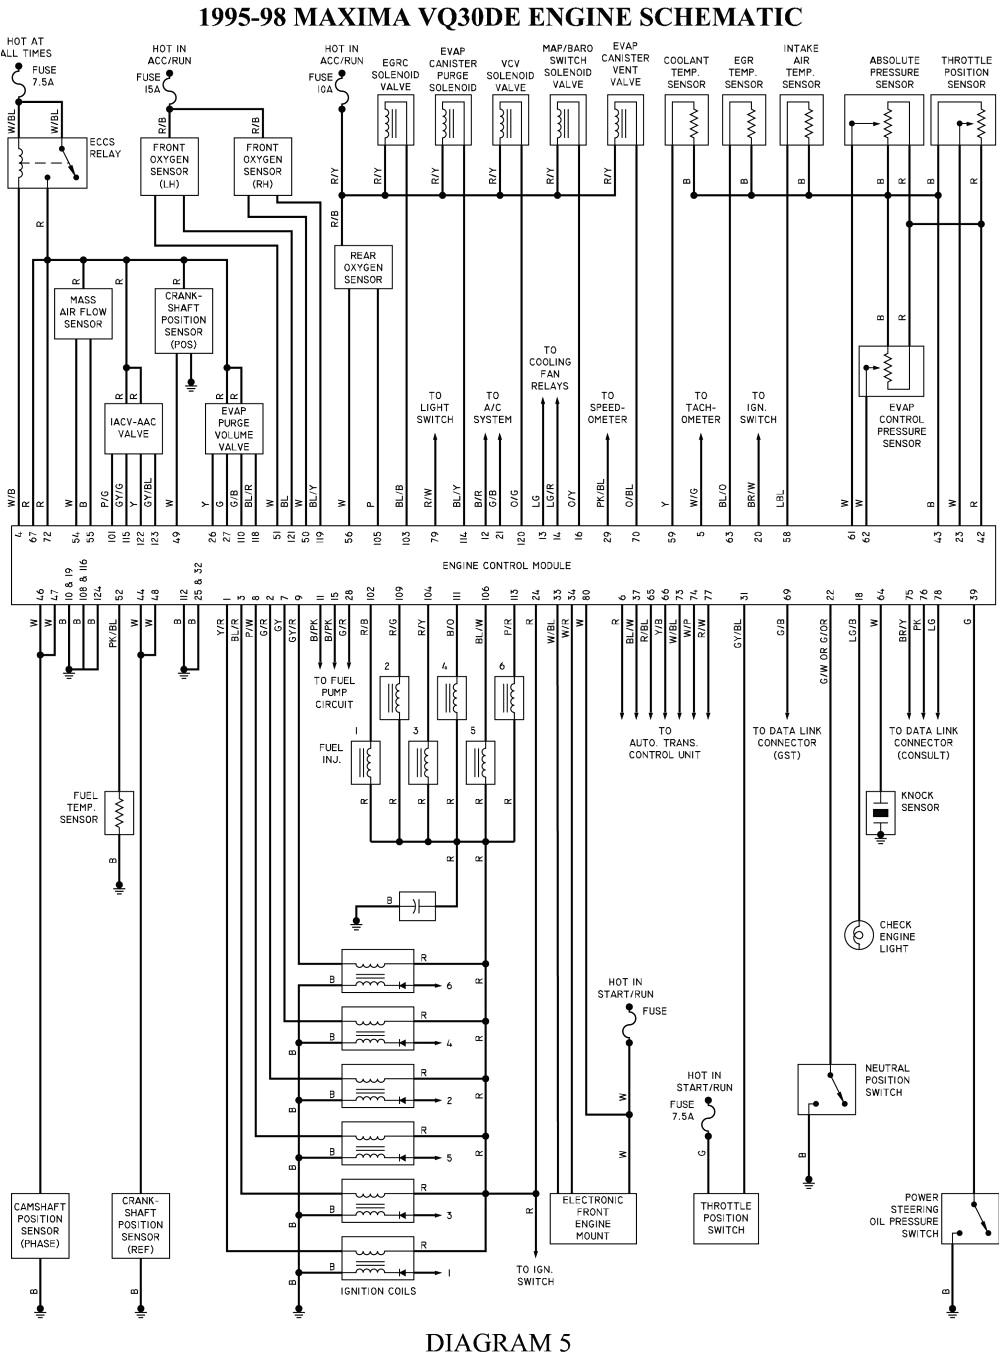 1995 nissan maxima wiring harness wiring diagram sheet 99 nissan maxima wiring diagram 99 nissan maxima wiring diagram